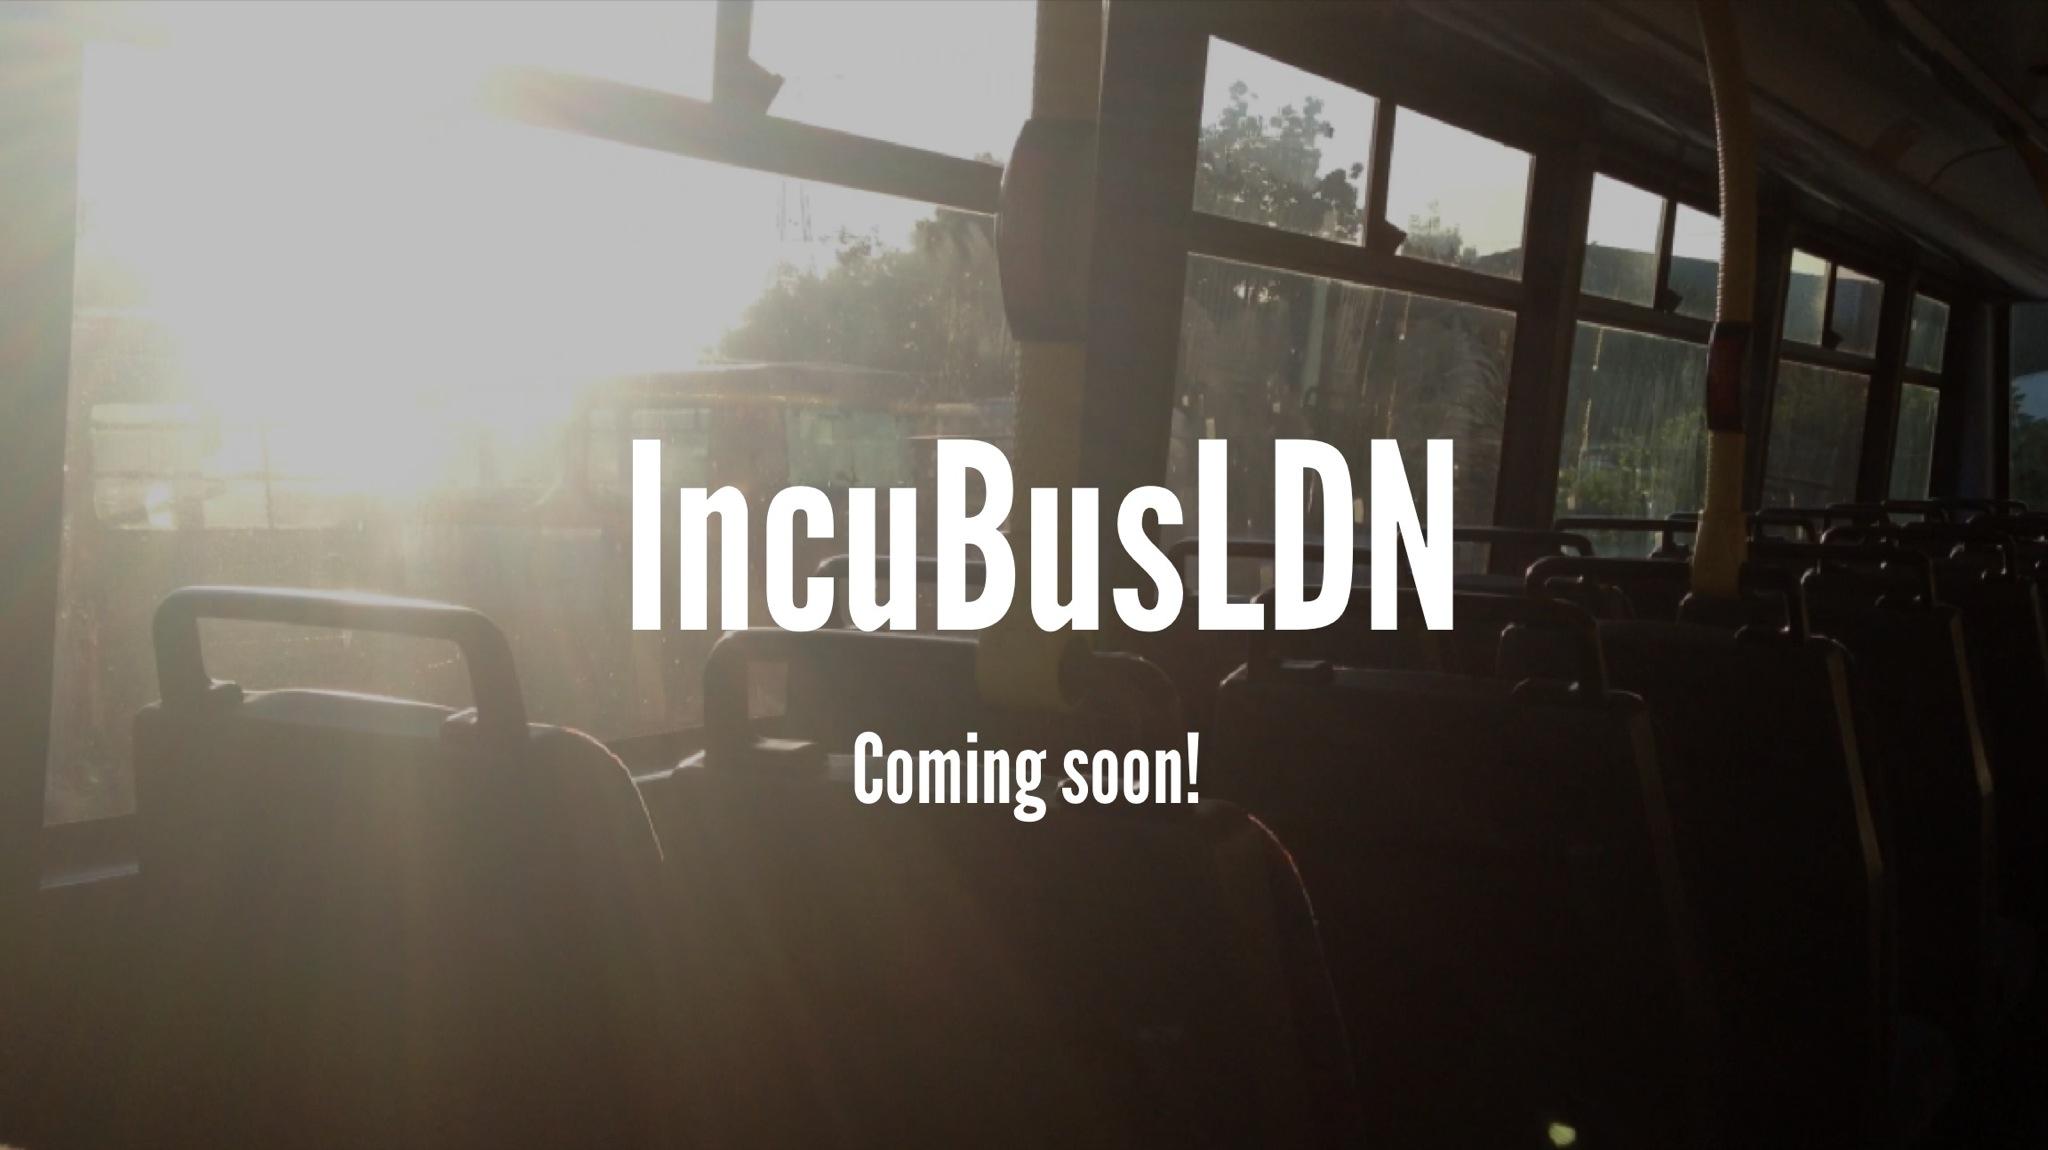 IncuBusLDN Coming Soon